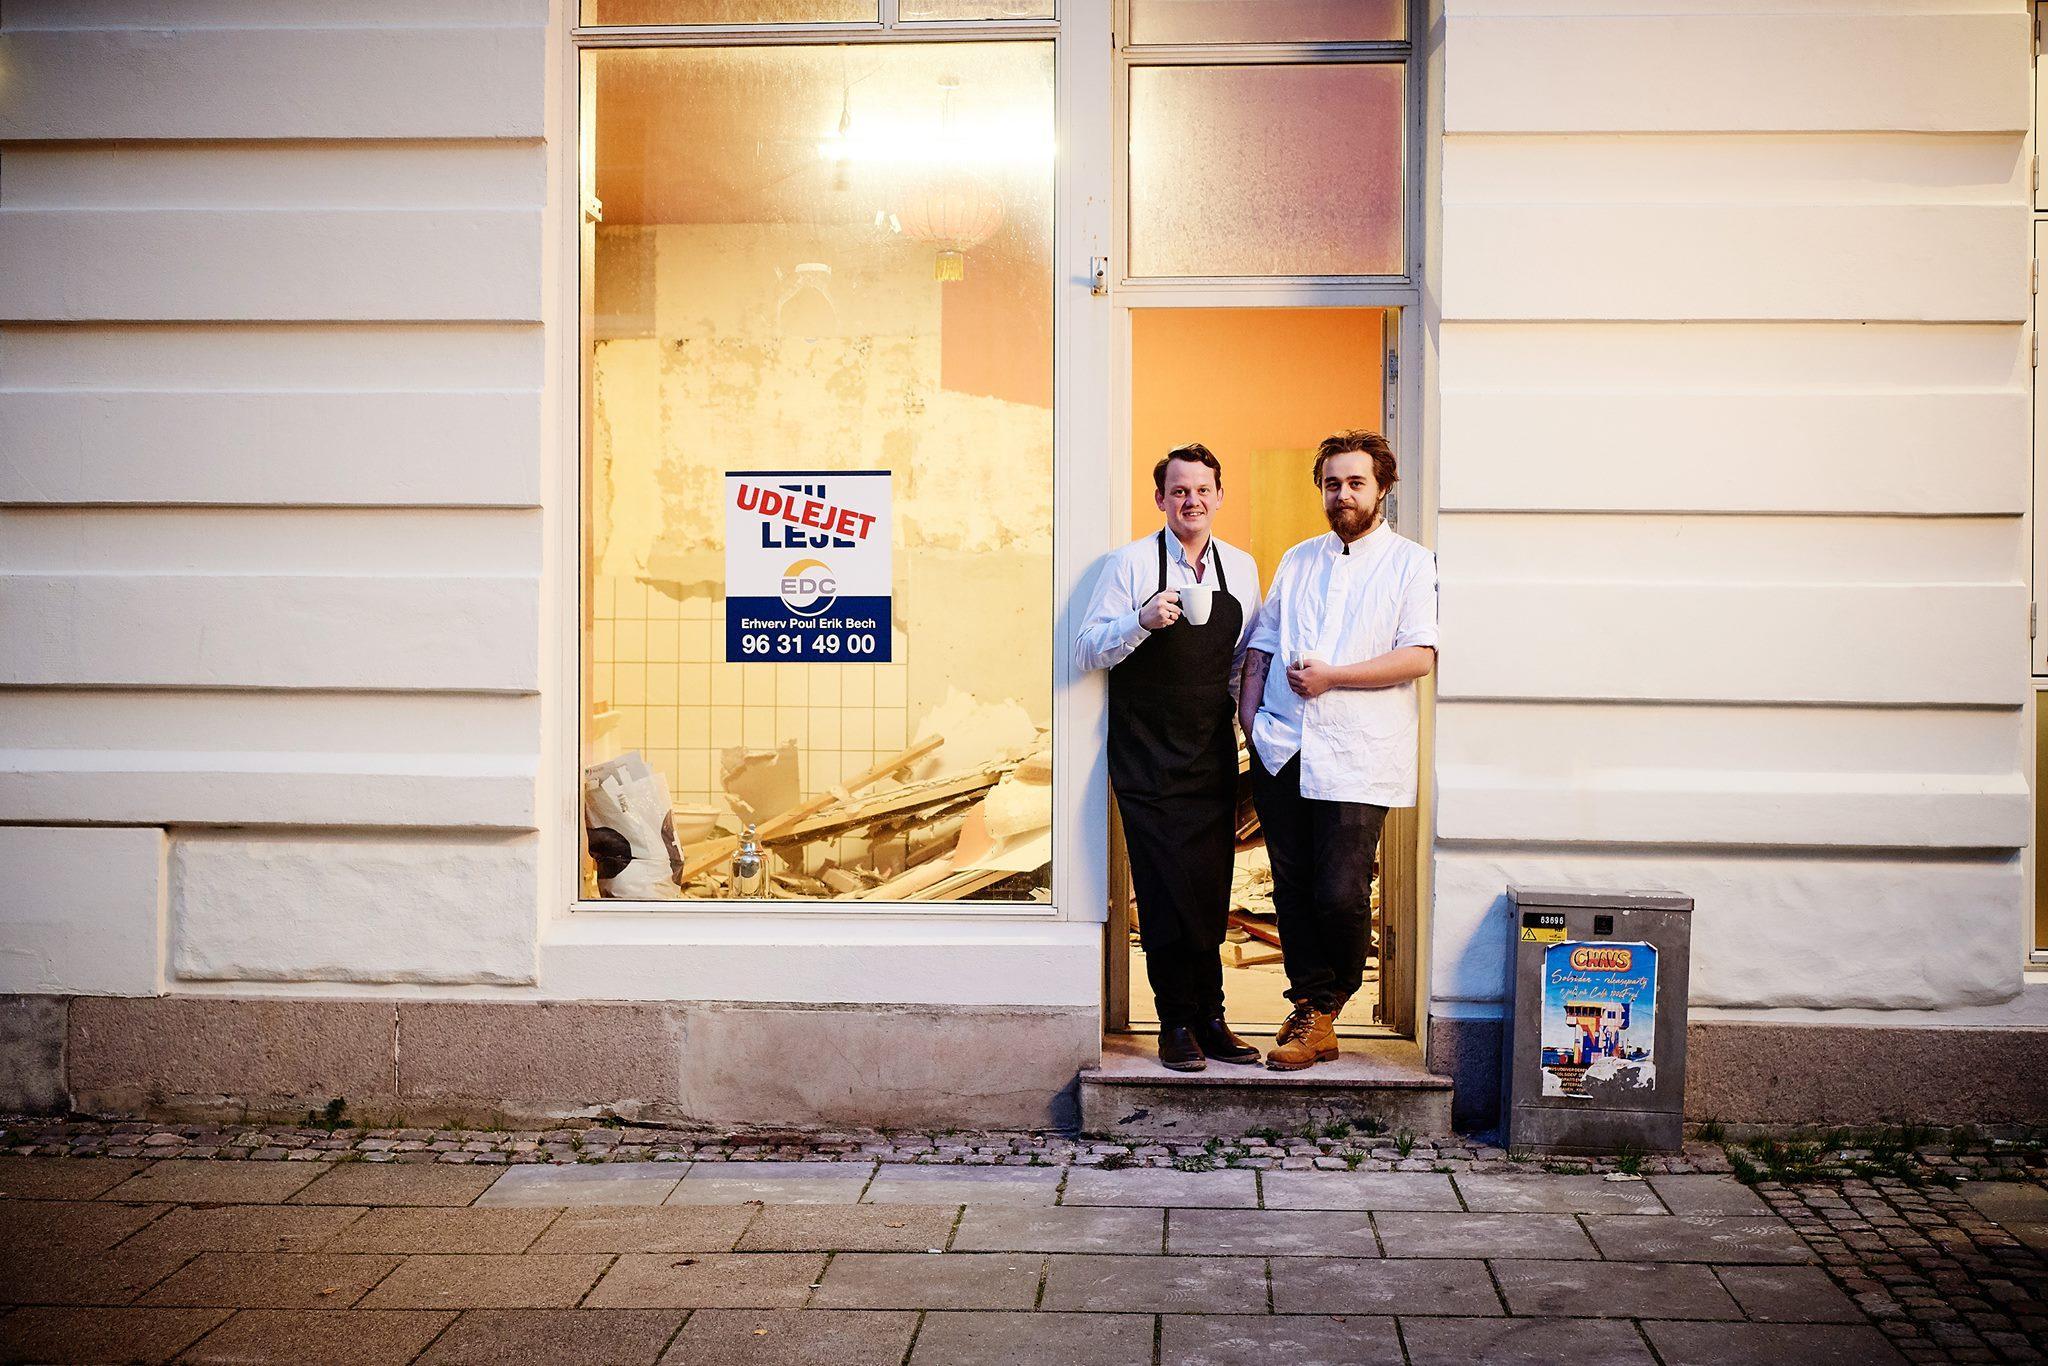 alimentum aalborg løkkegade gourmet restaurant café 9000 nordens paris dinnerlust reserver bord menukort åbningstider